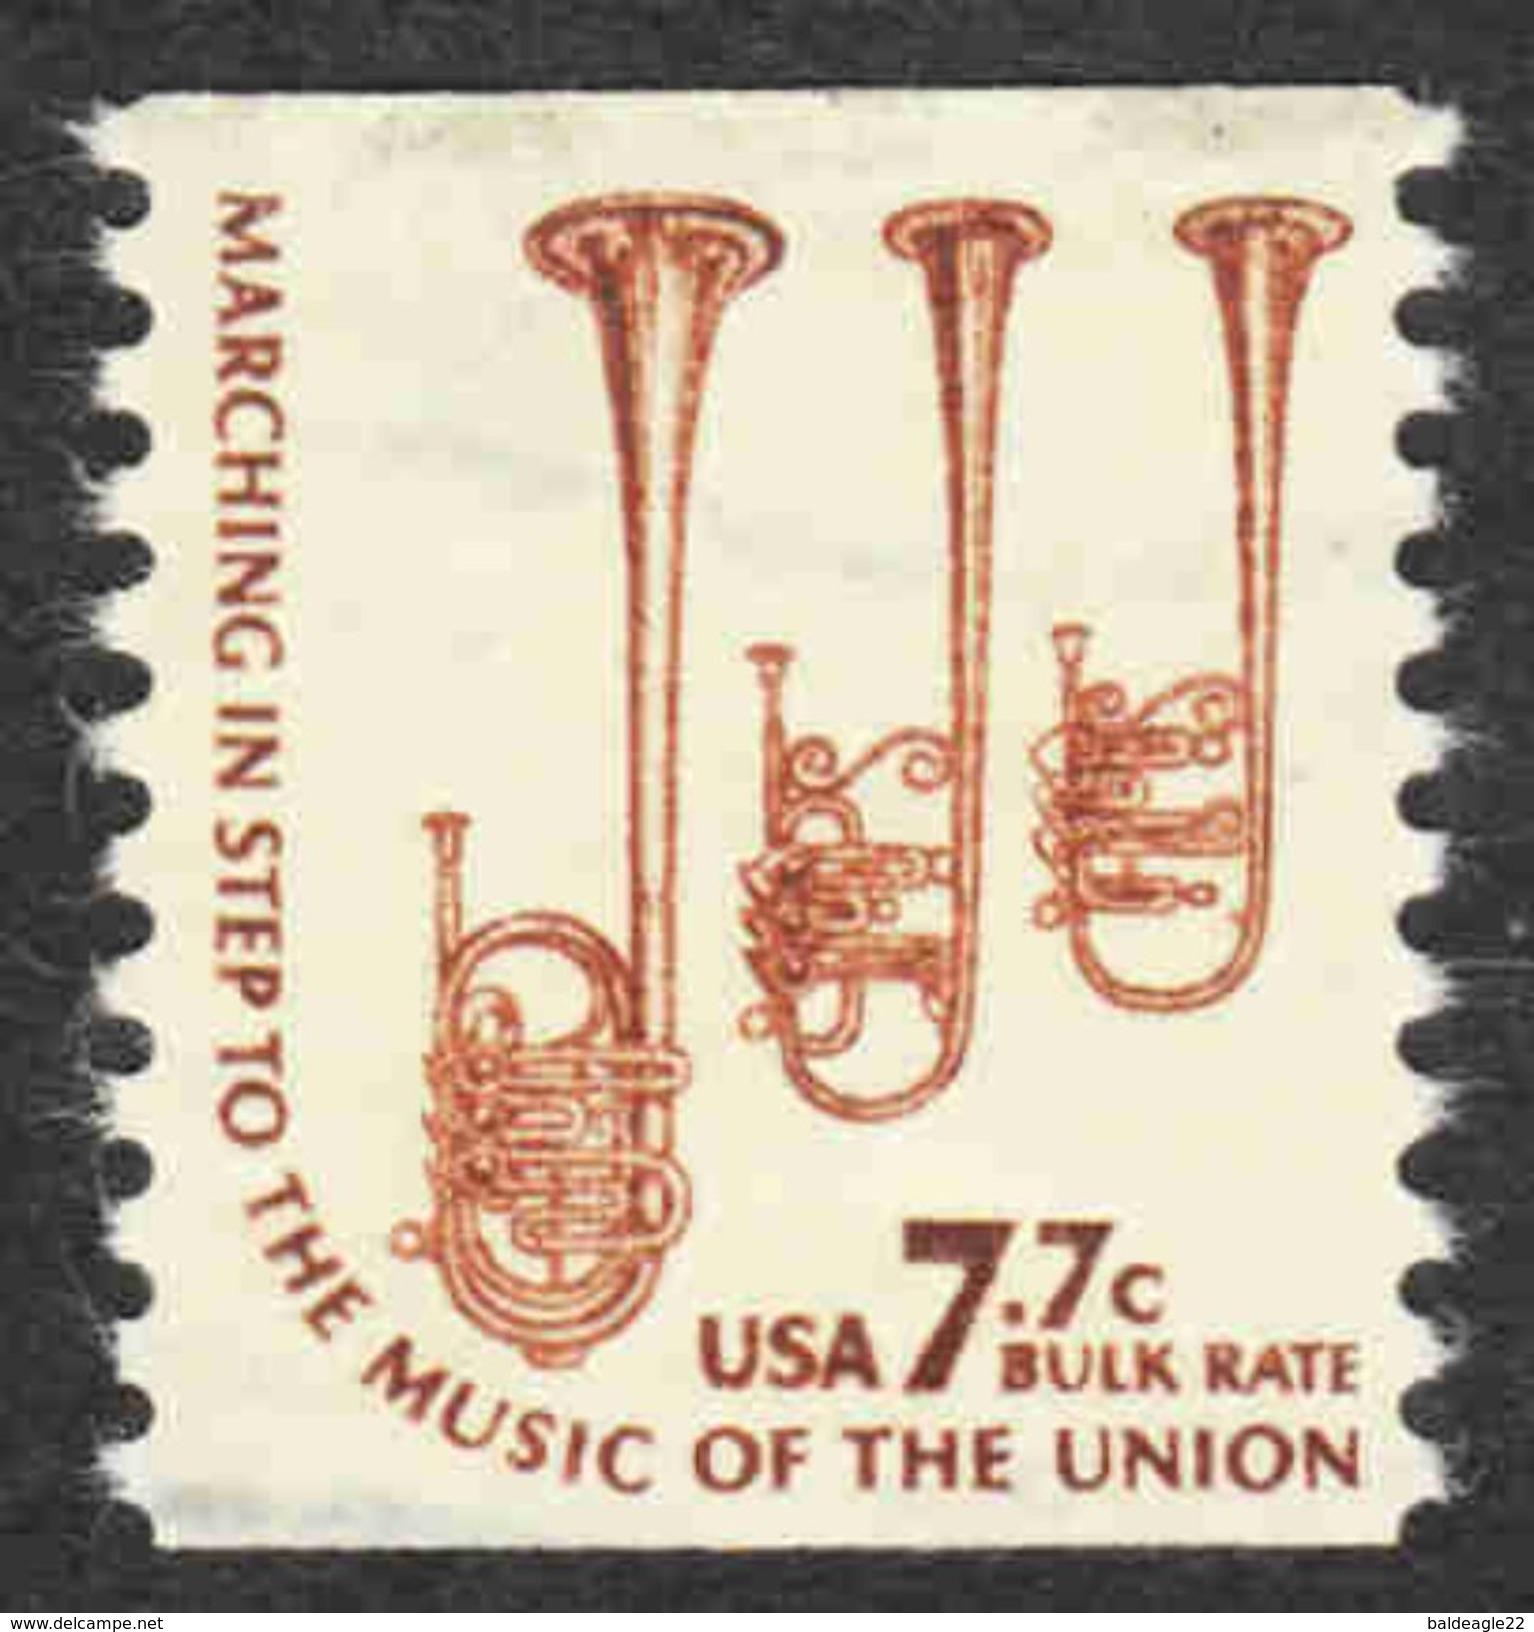 United States - Scott #1614 Used (2) - Coils & Coil Singles